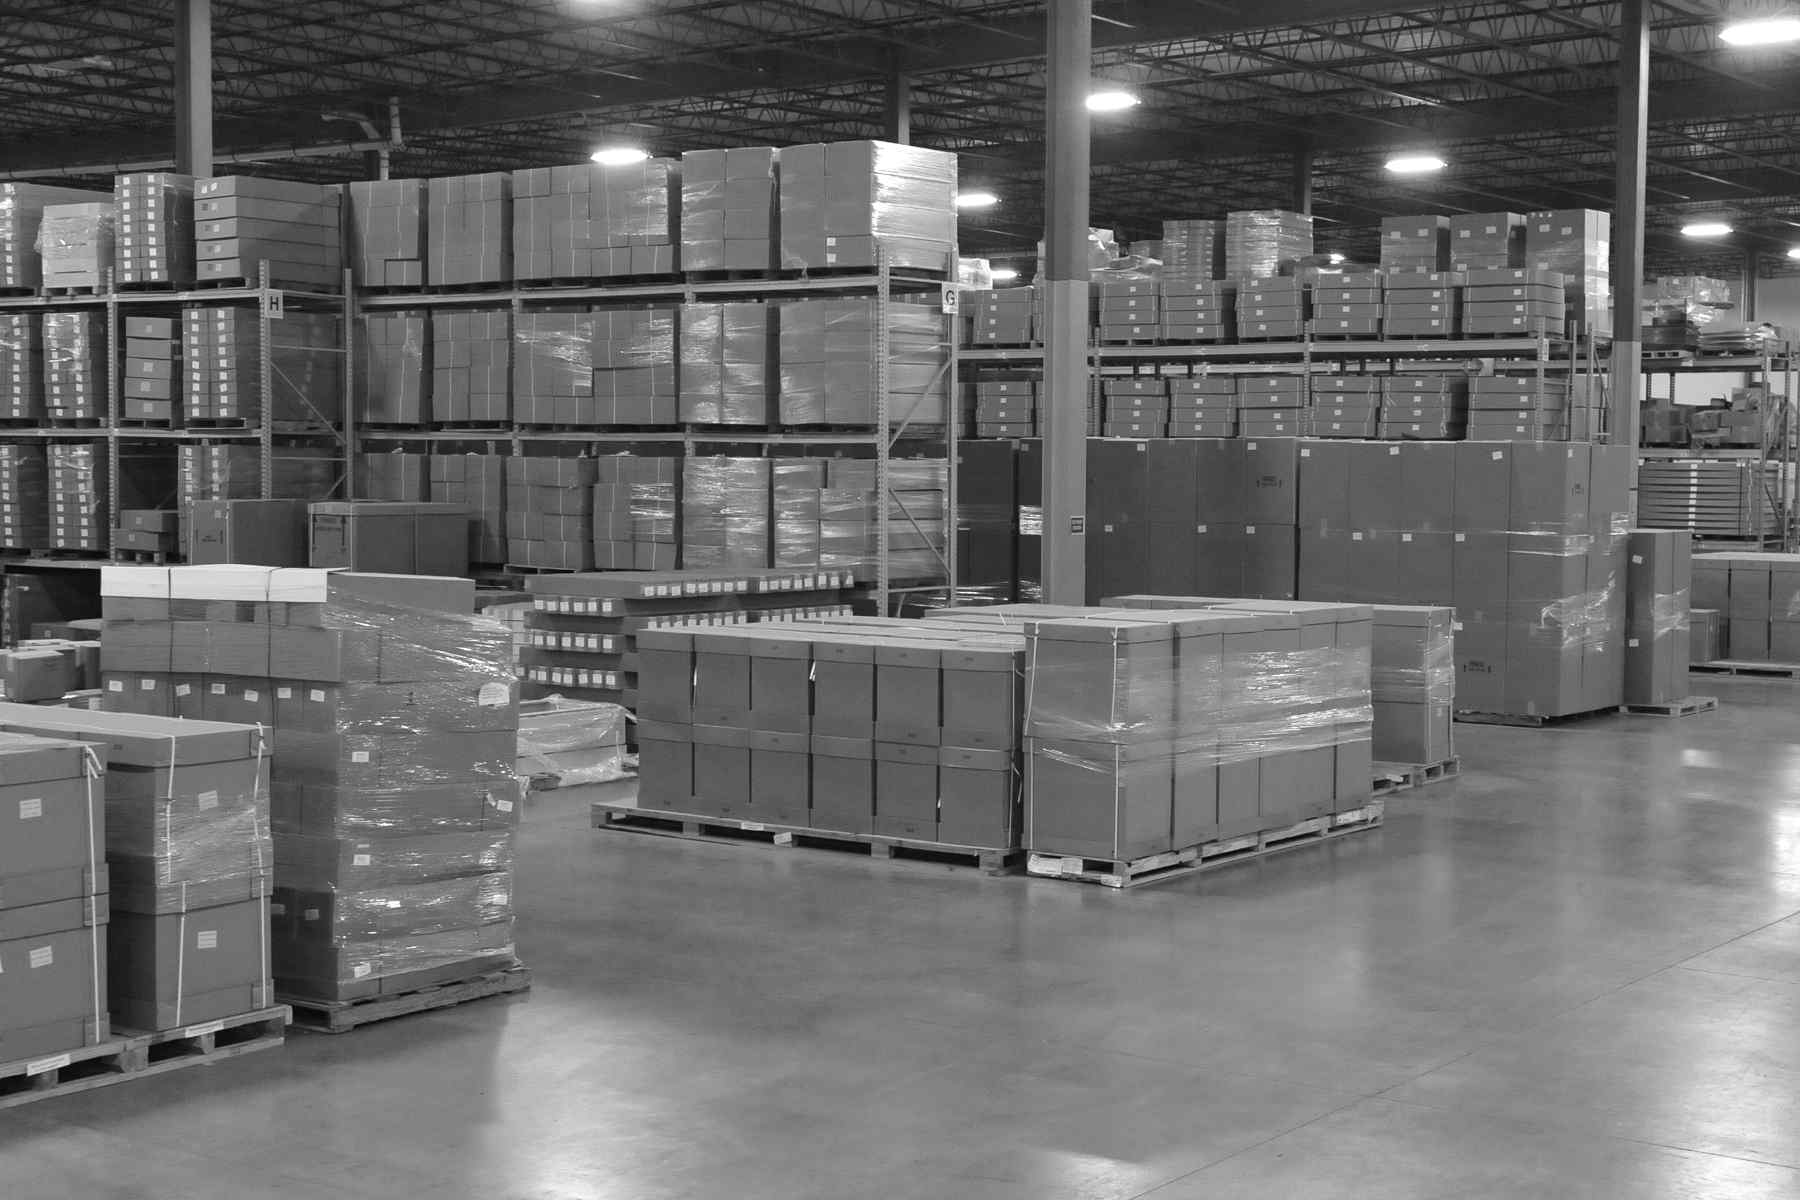 https://mw-sf.com/wp-content/uploads/2019/11/inventory-management-06.jpg